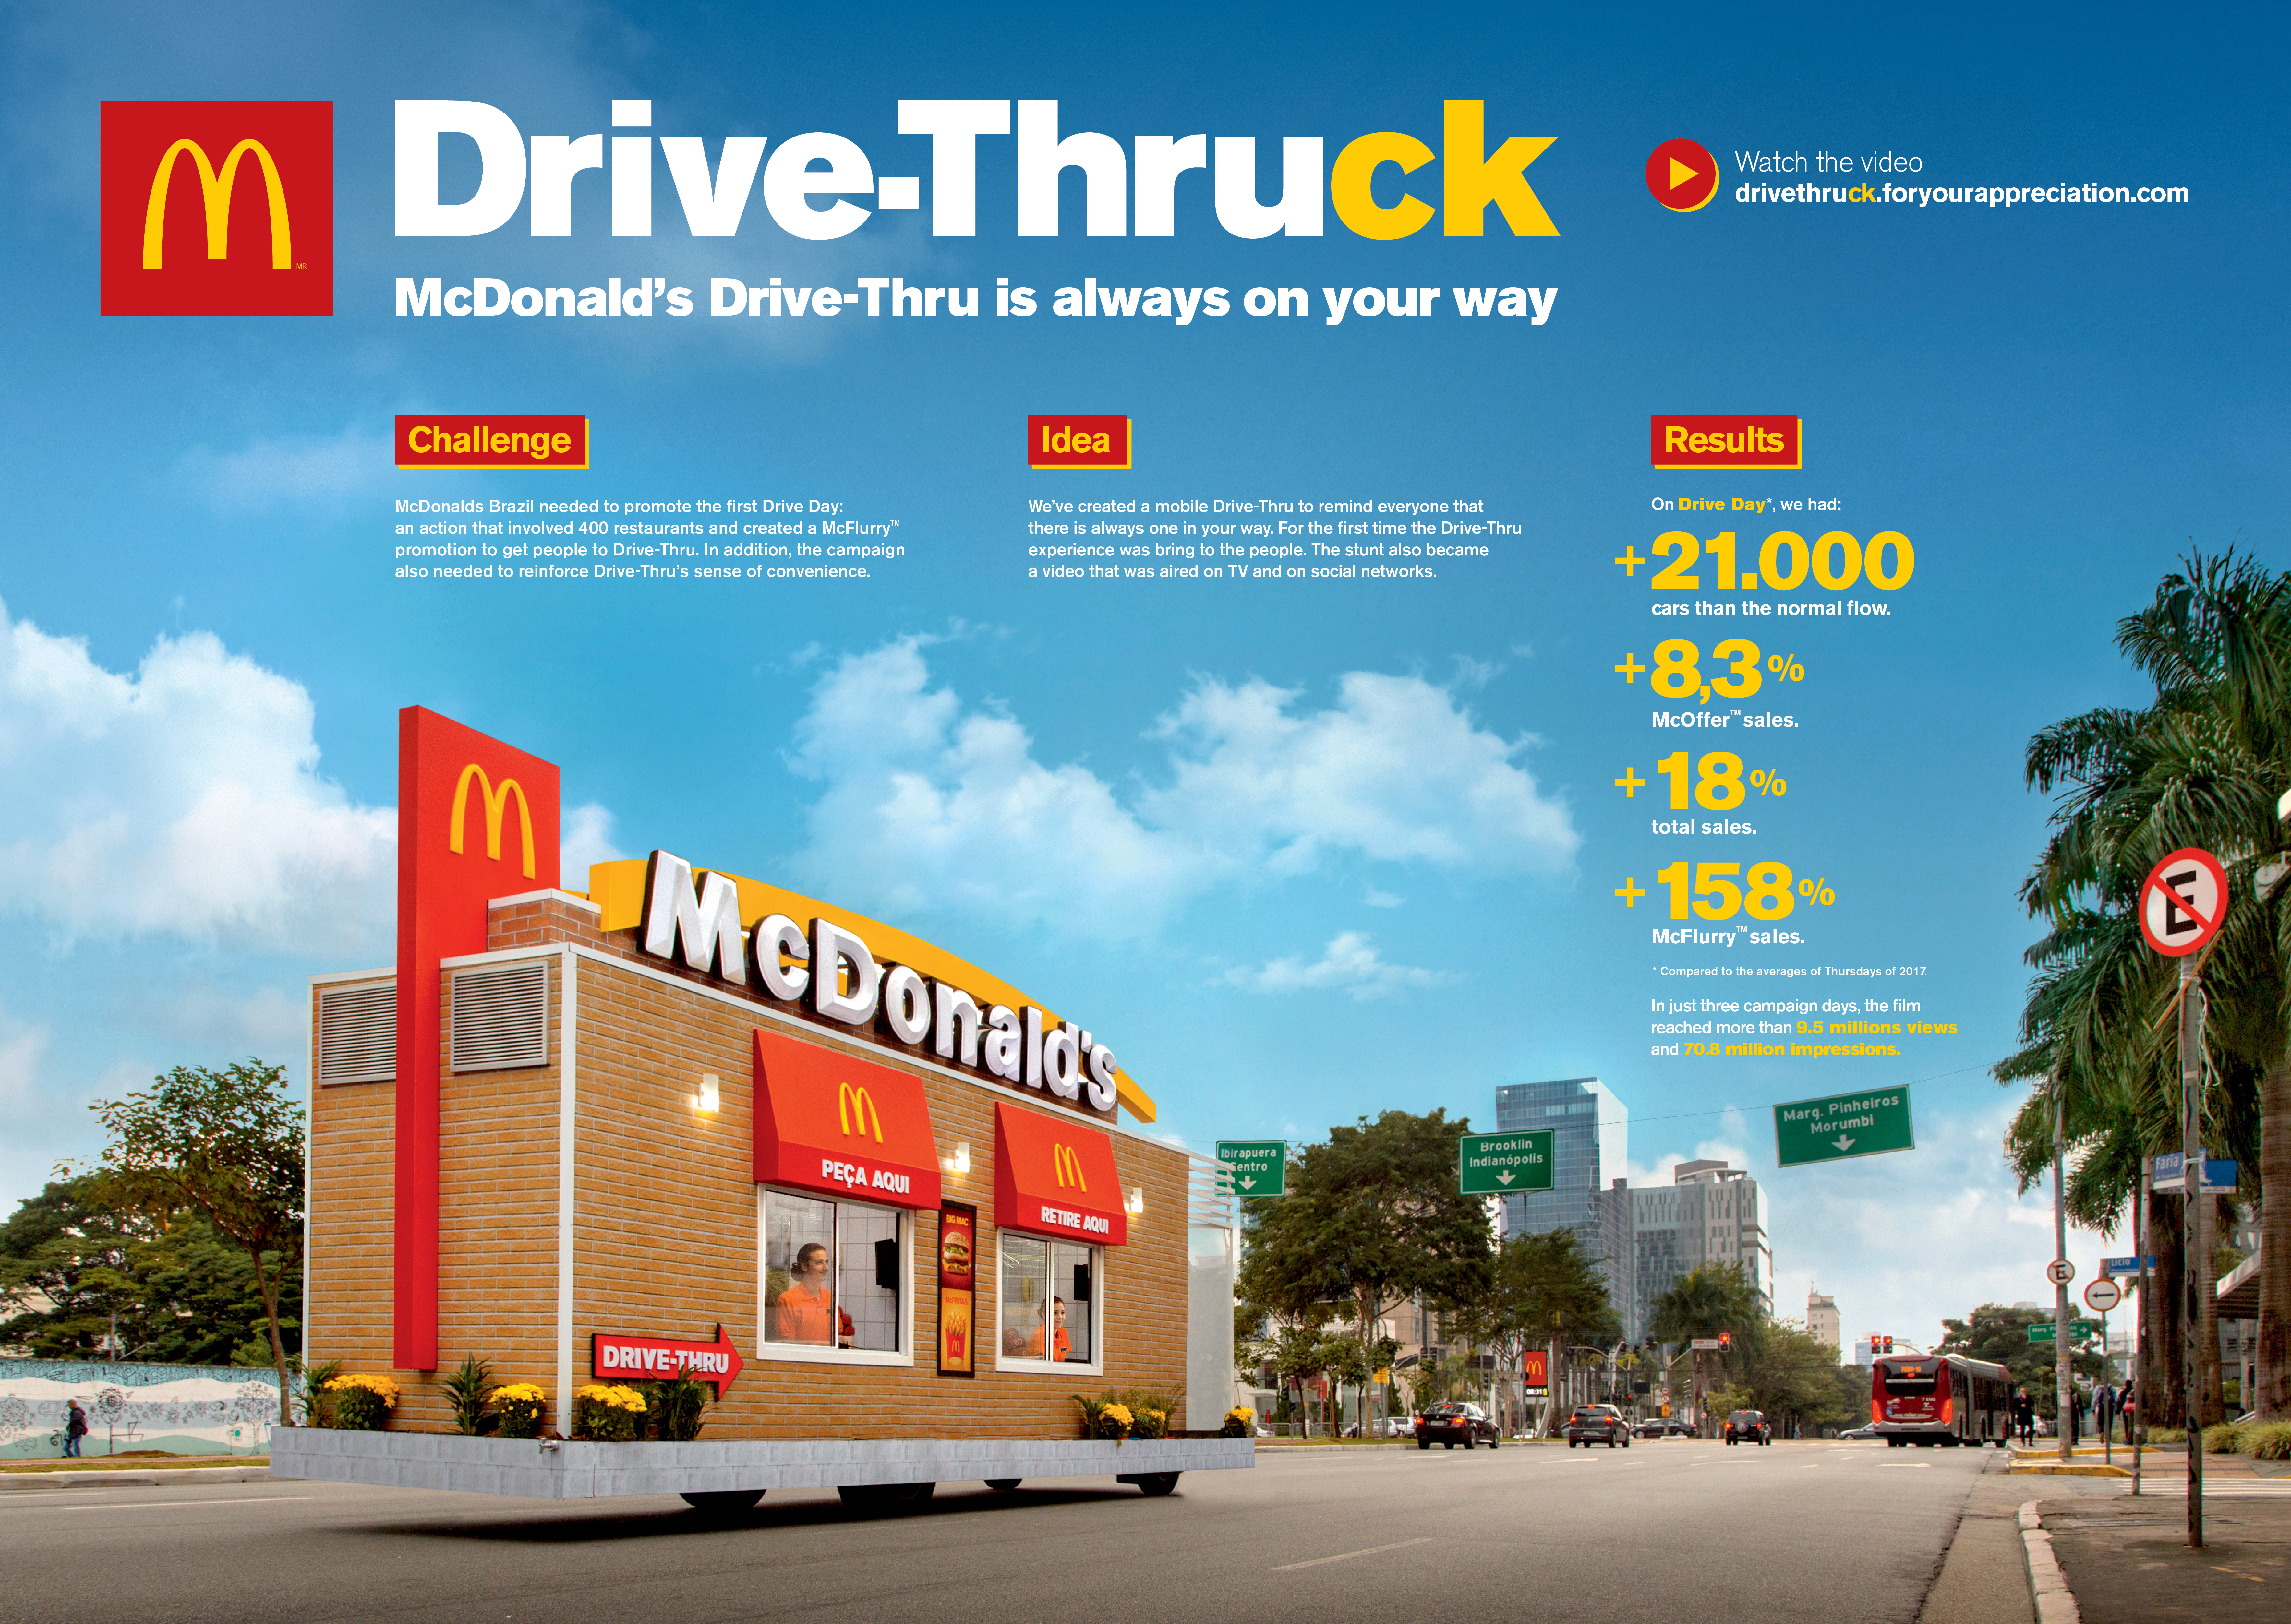 Drive-Thruck Thumbnail